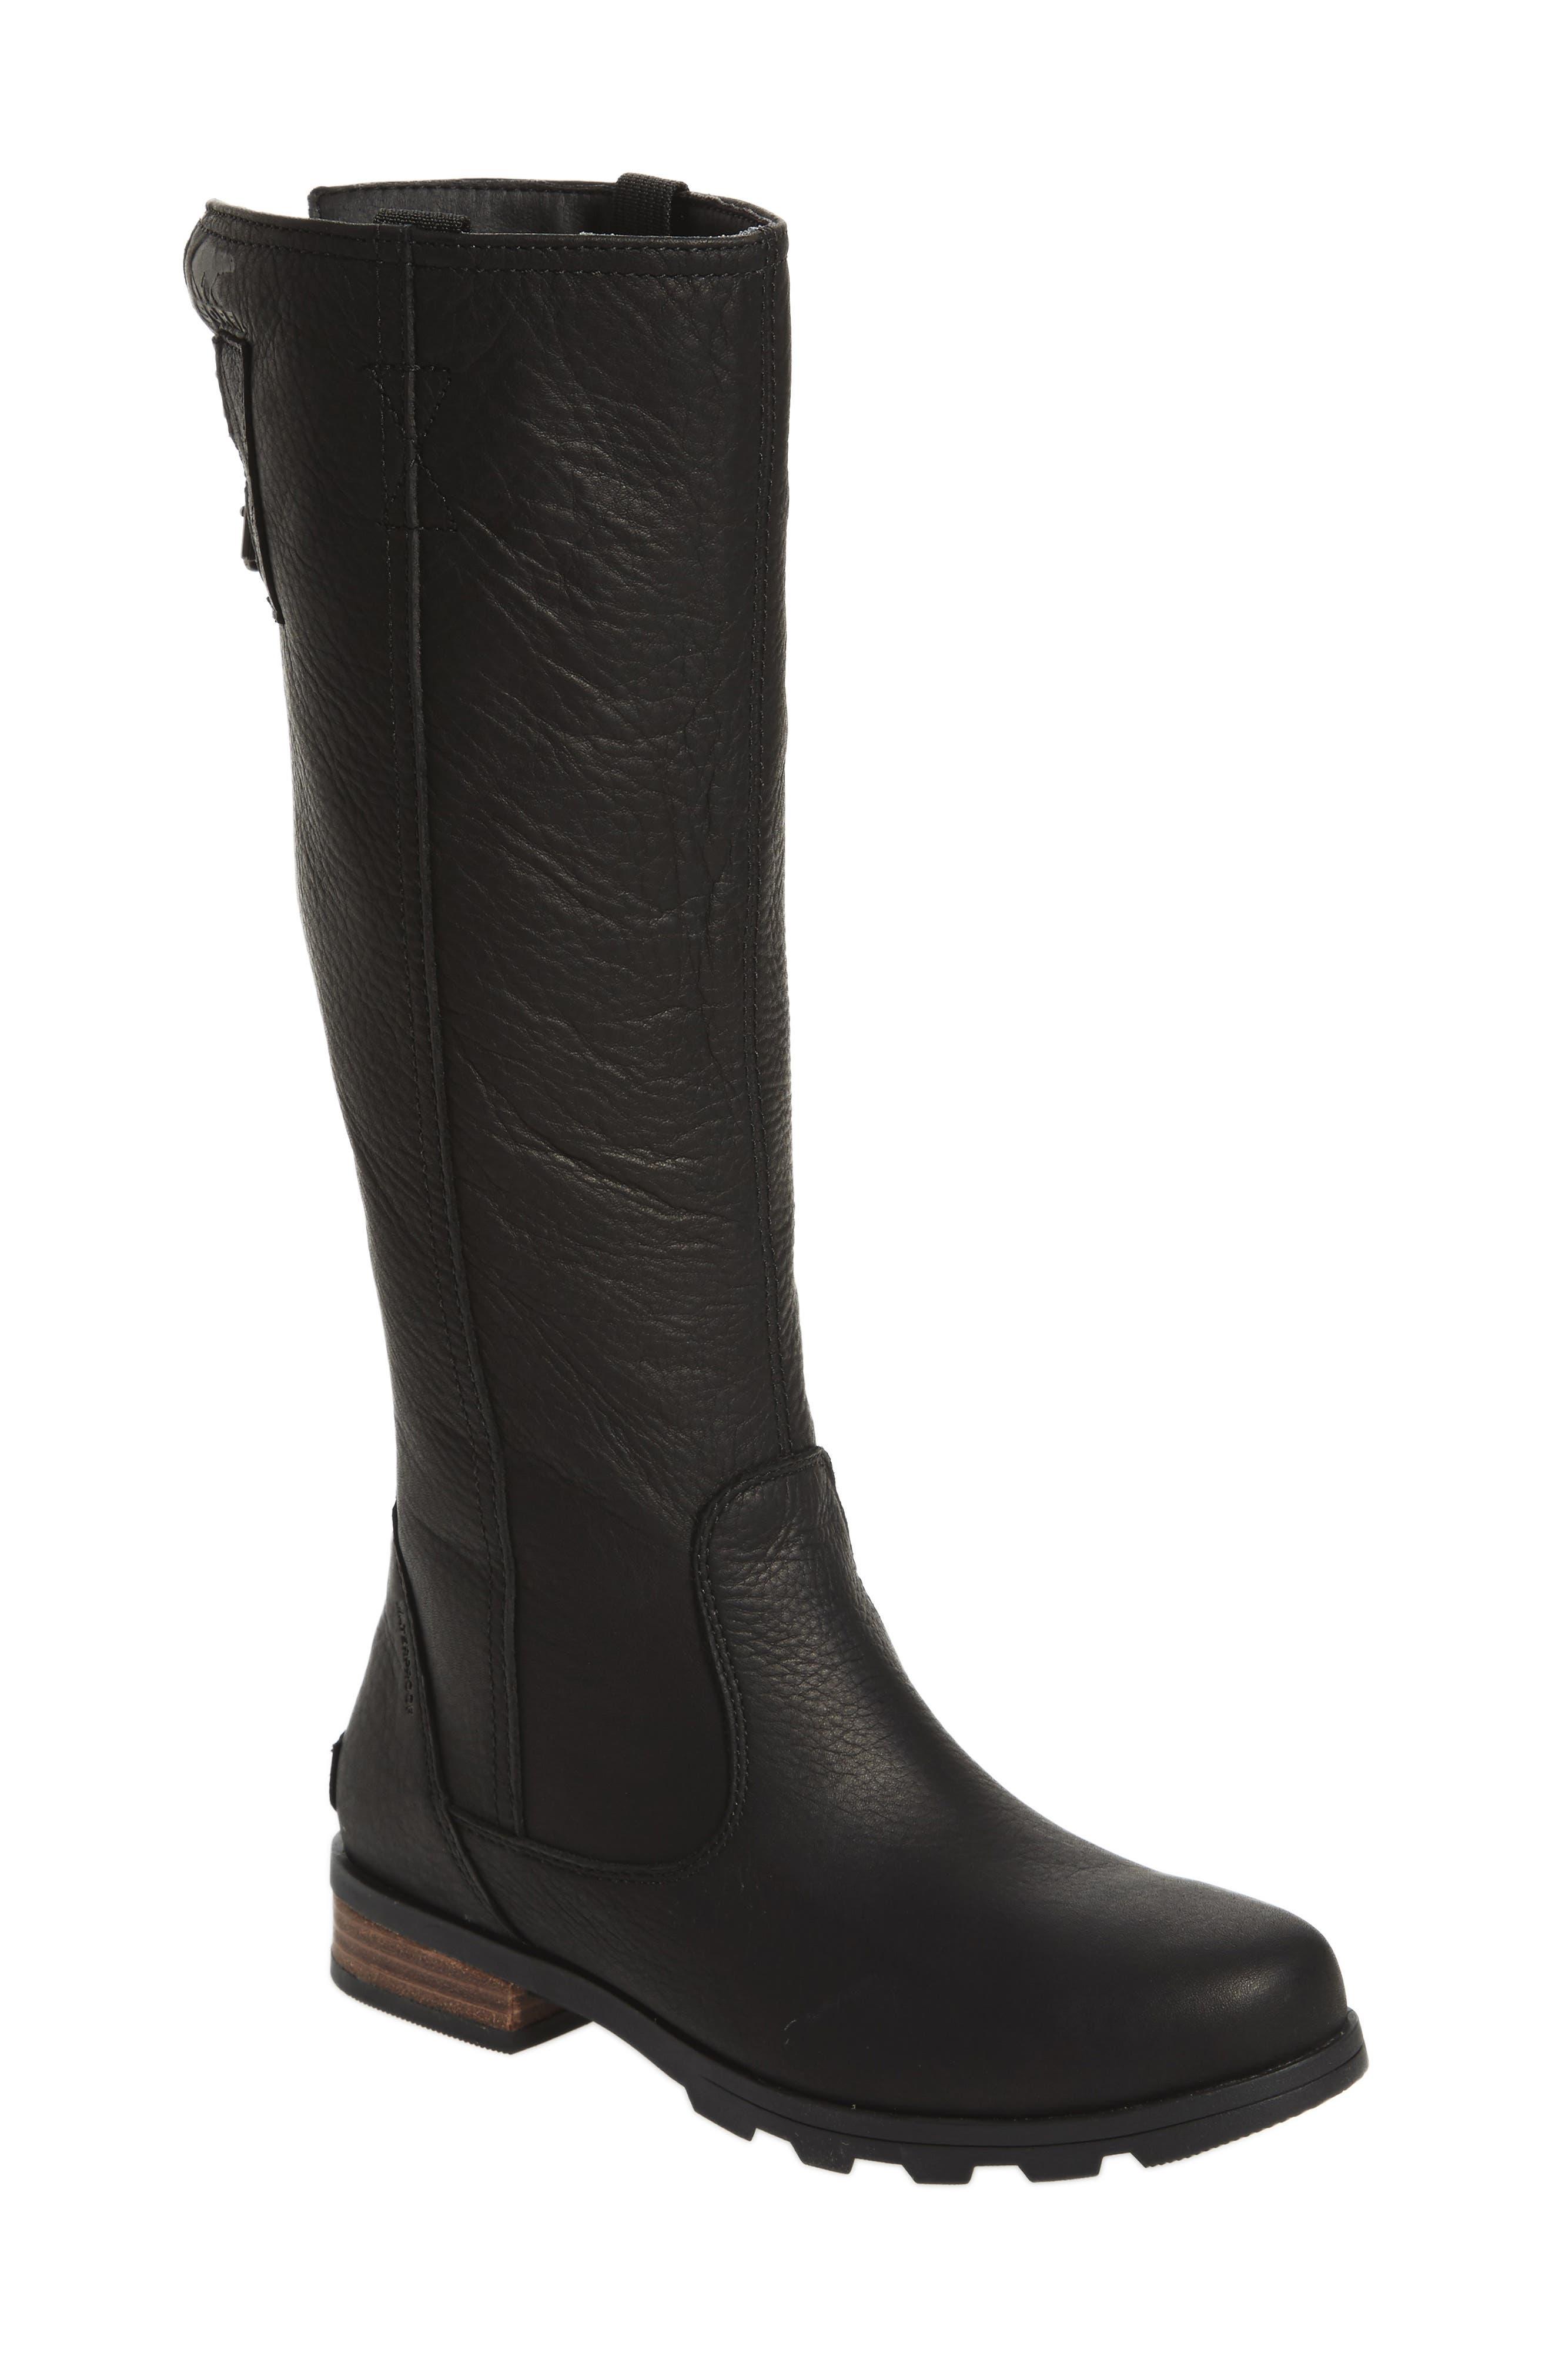 Main Image - SOREL Emelie Premium Knee High Boot (Women)